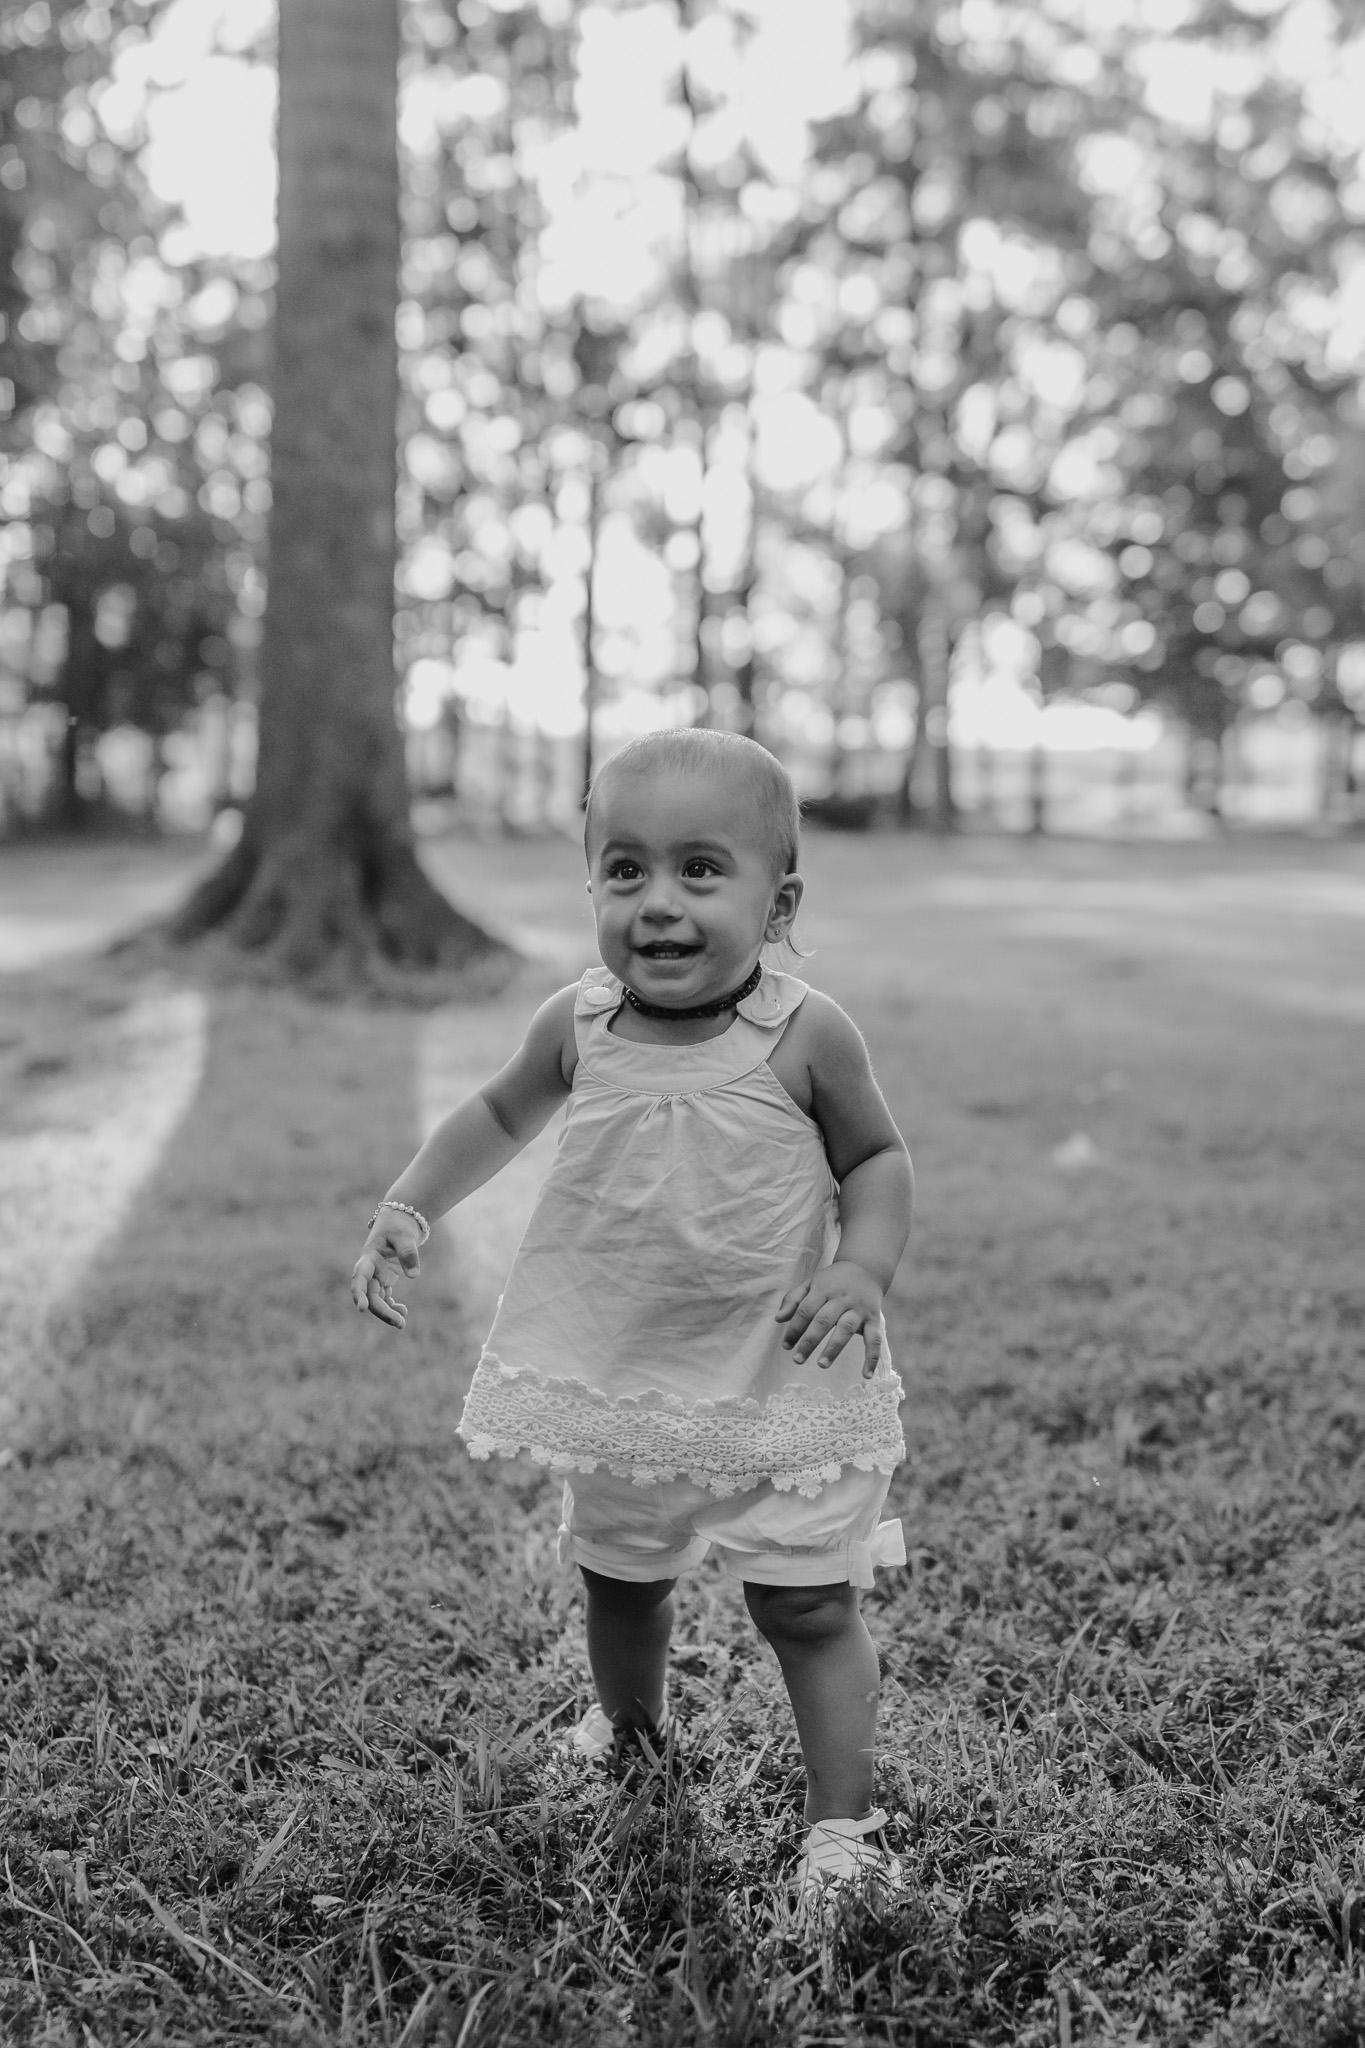 baby walking black and white photo